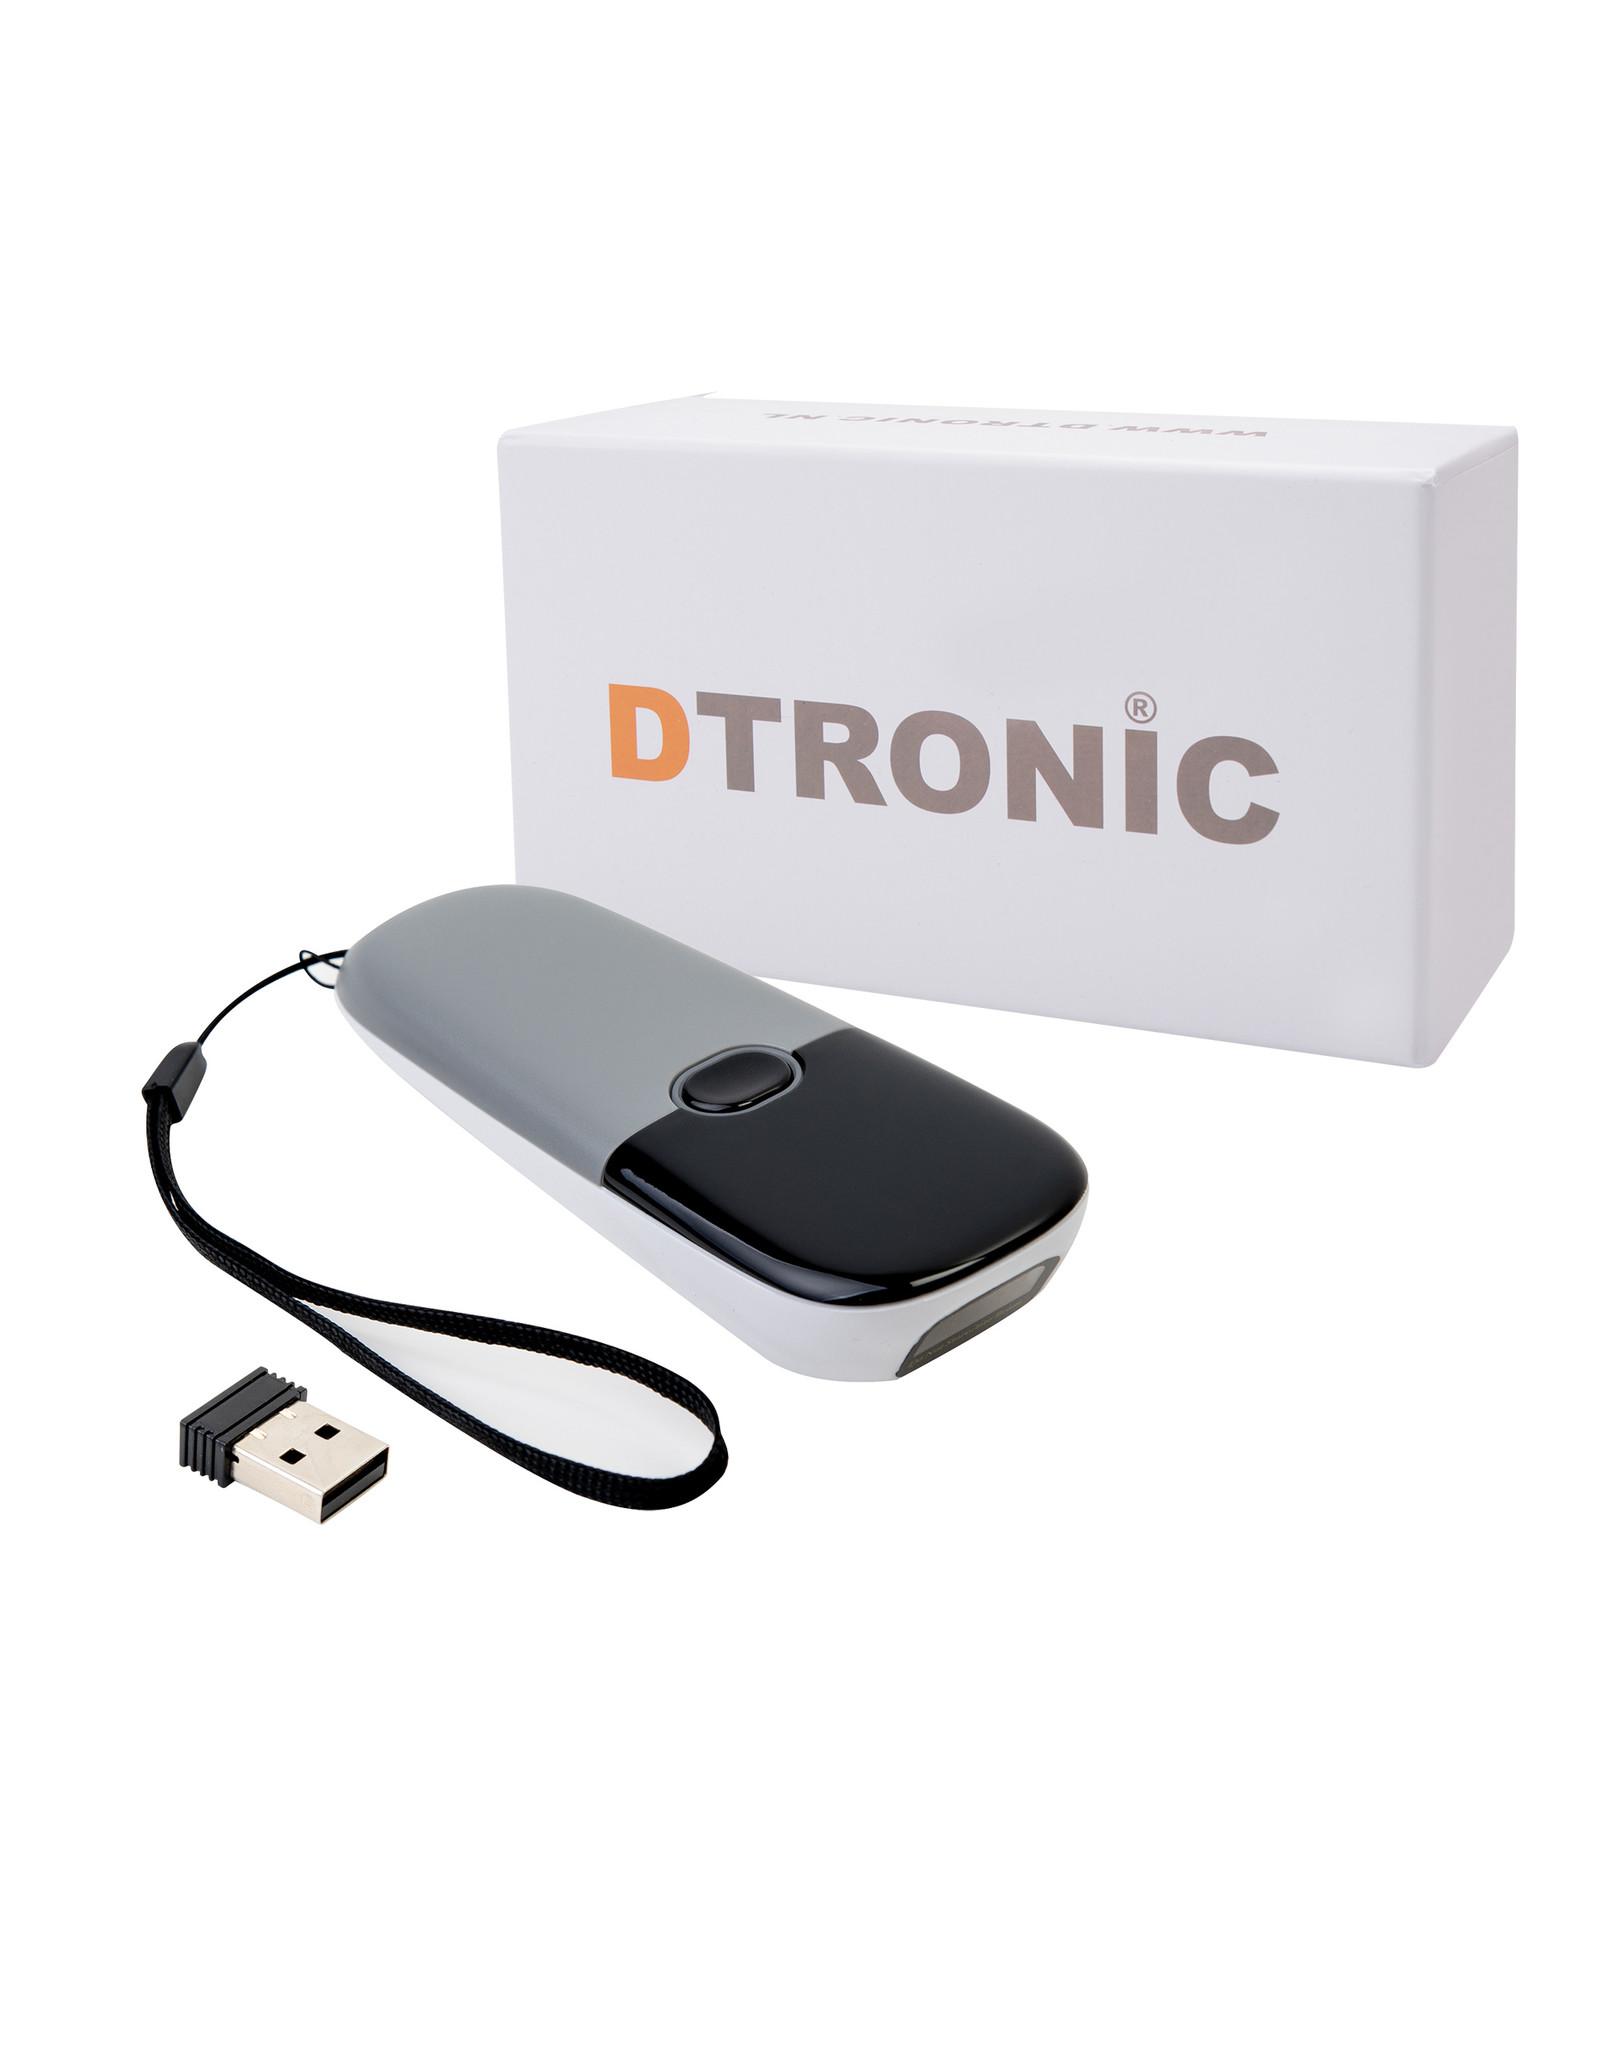 DTRONIC Pocket barcodescanner | DTRONIC DI9120 - Scant alle streepjescodes